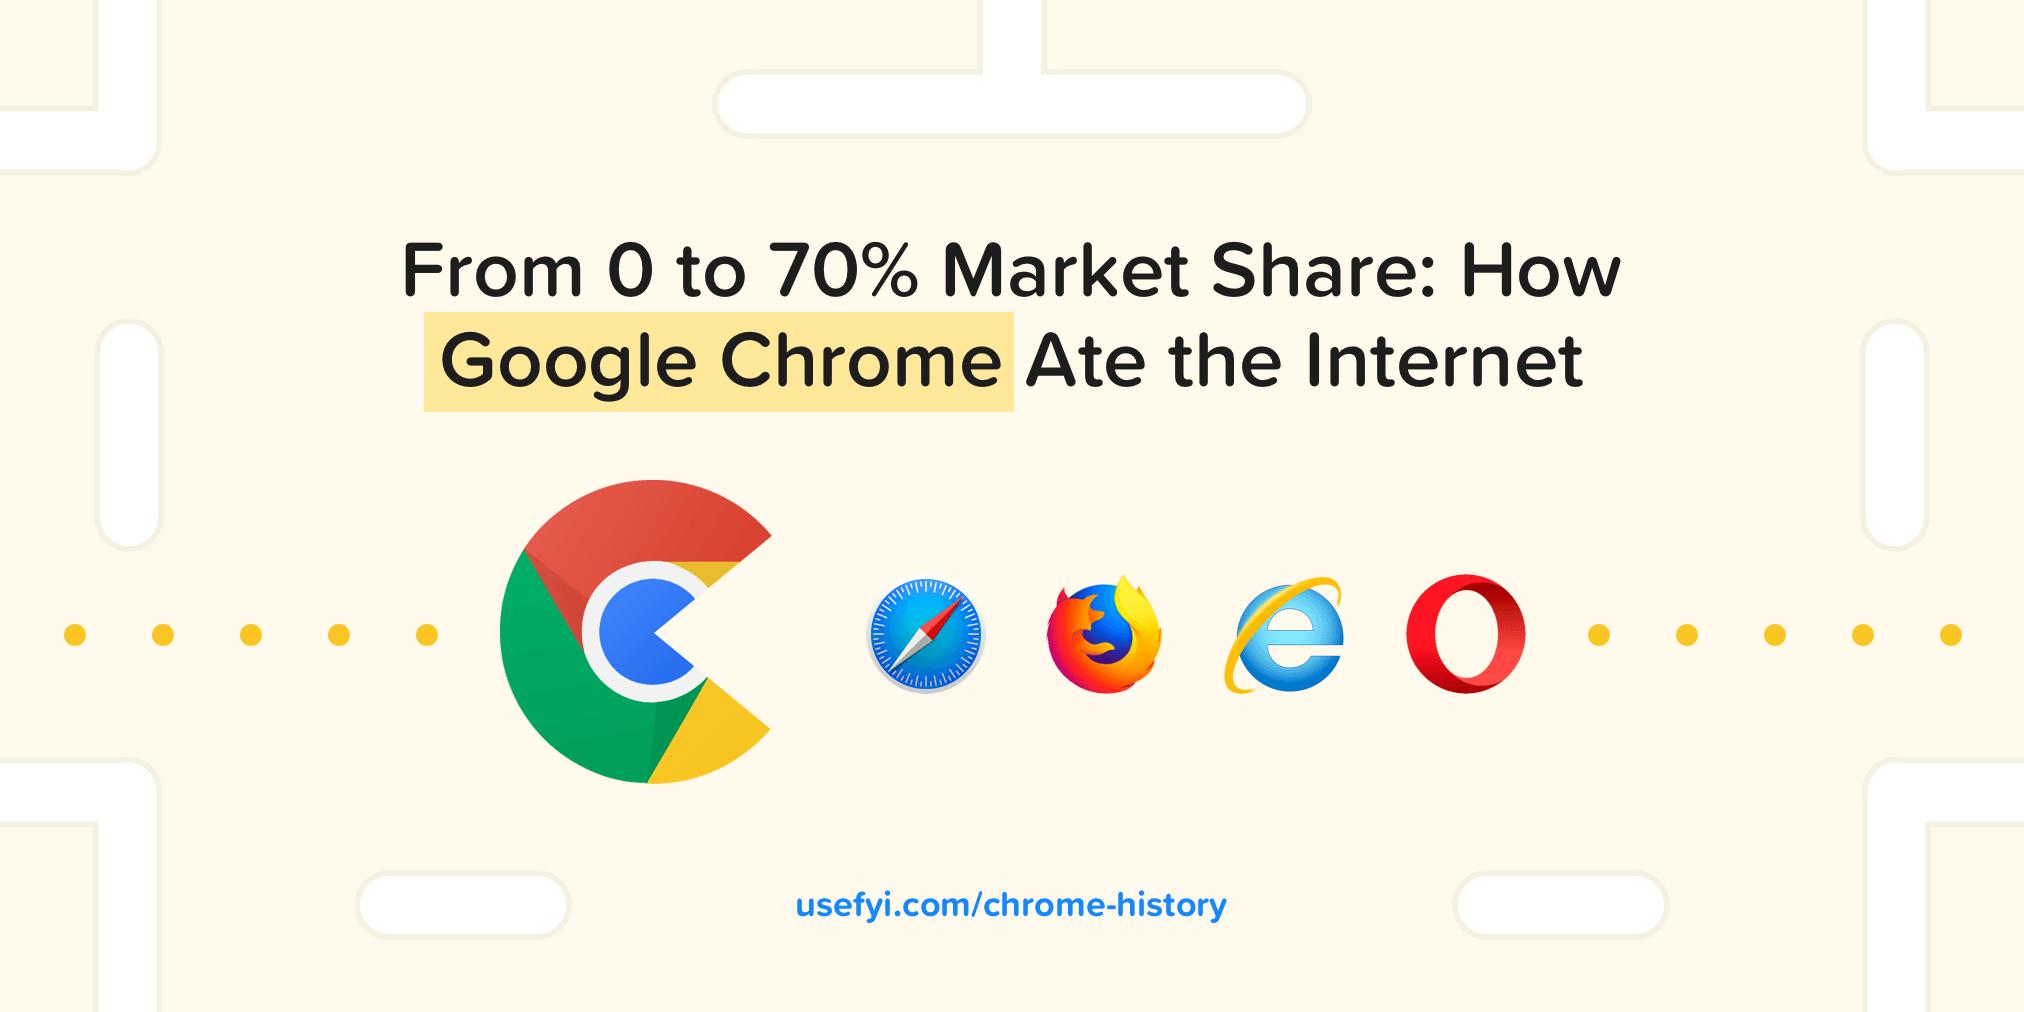 [Перевод] От 0% до 70% рынка: Как Google Chrome поглотил интернет?